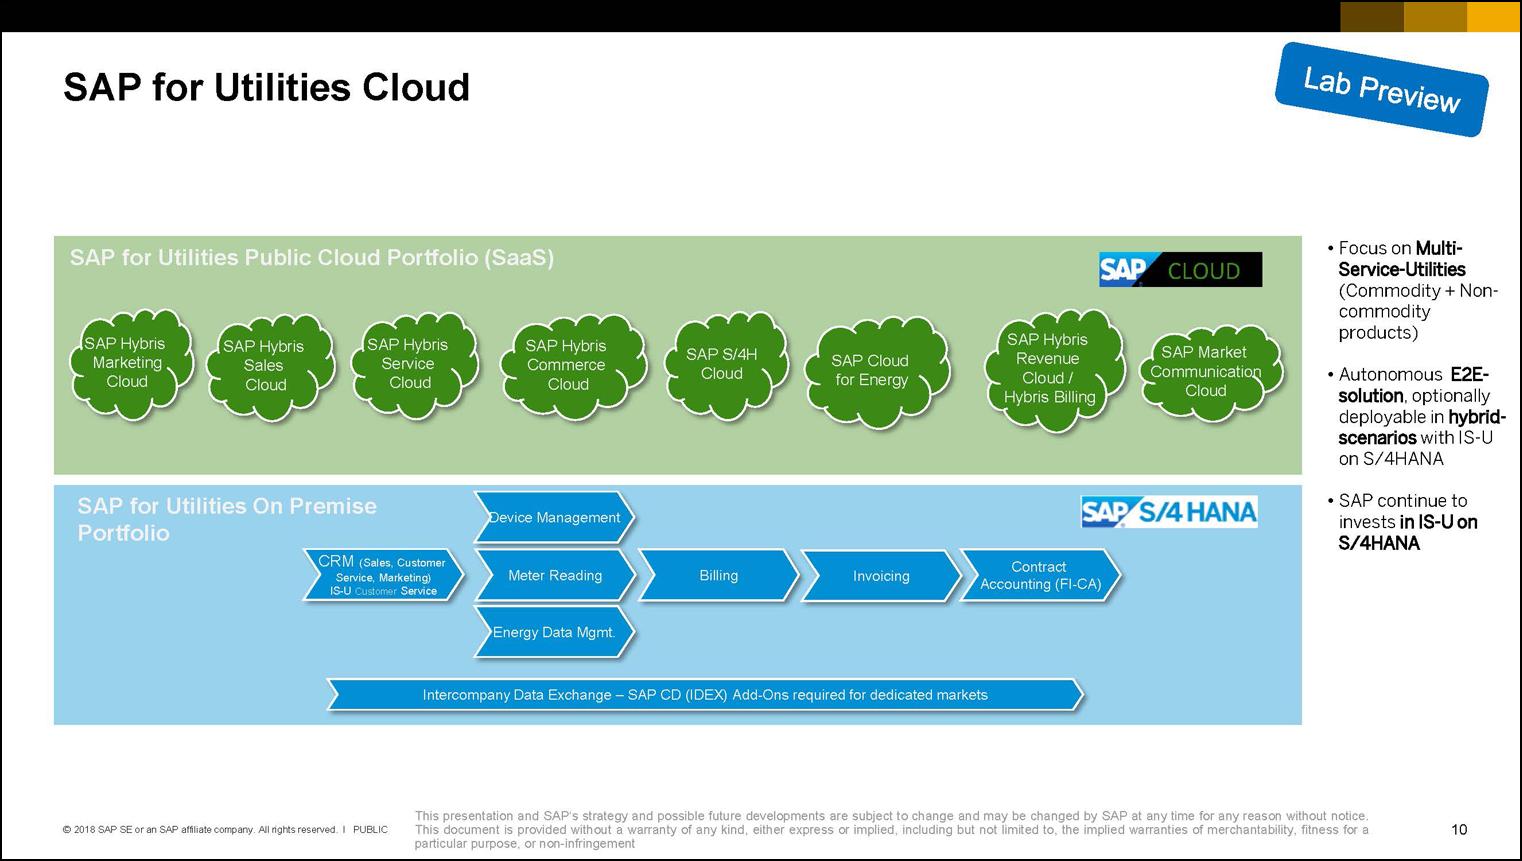 SAP fro Utilities Cloud